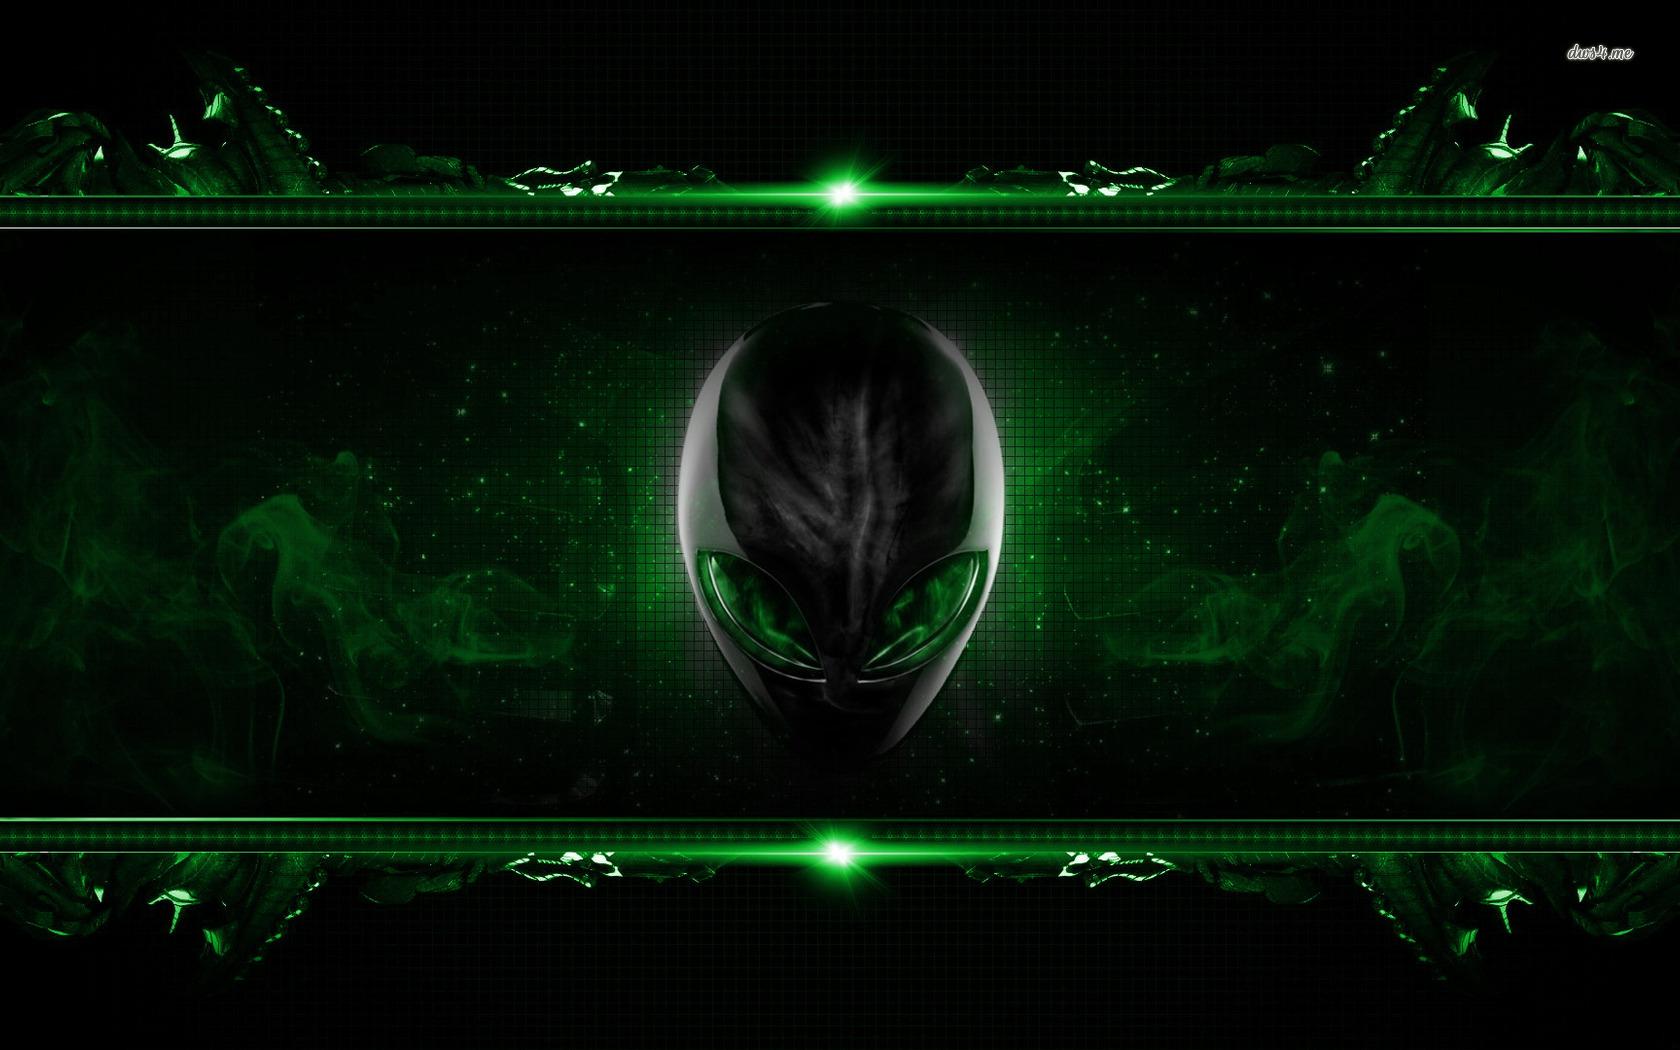 Alienware wallpaper 1280x800 Alienware wallpaper 1366x768 Alienware 1680x1050